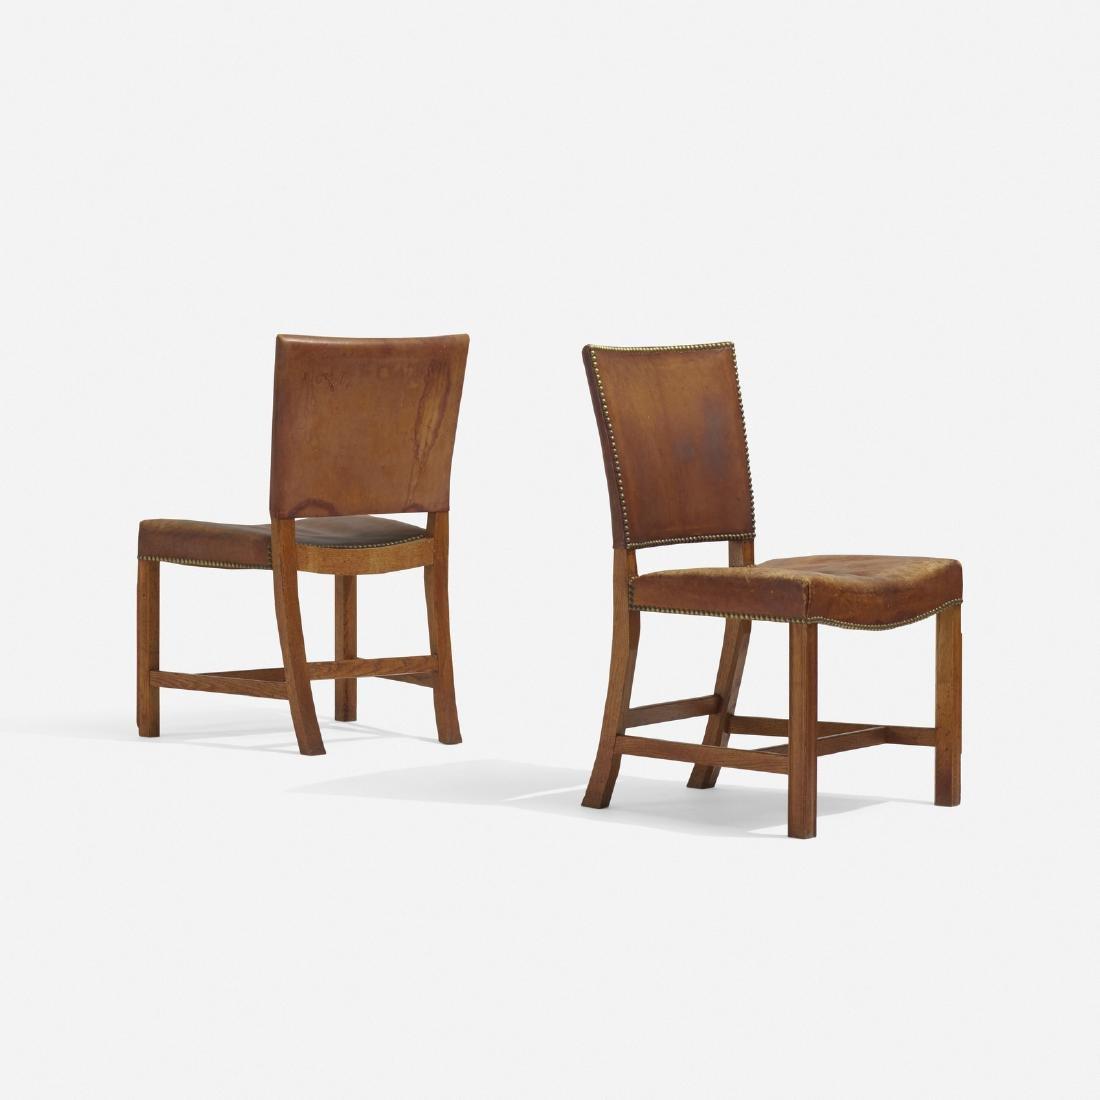 Kaare Klint, Barcelona chairs model 3758, pair